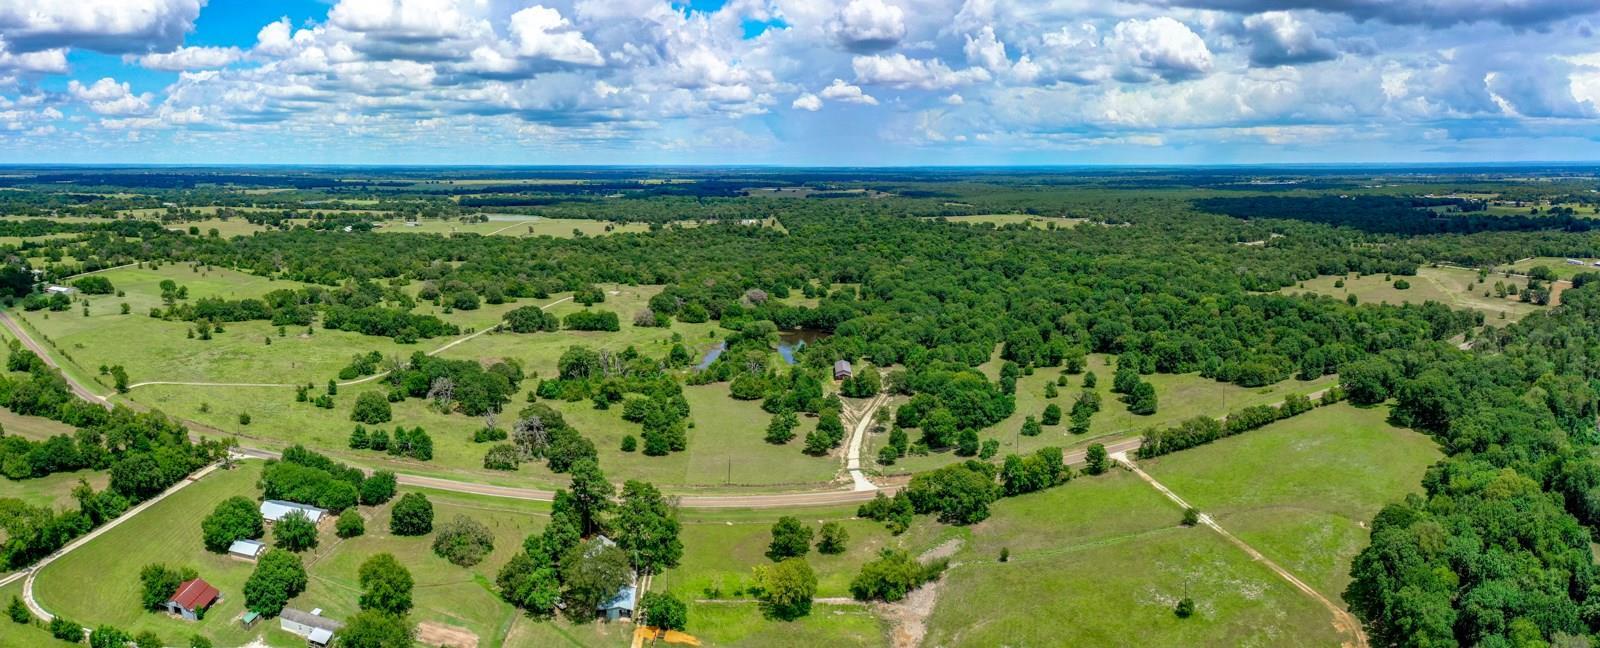 TBD Farm To Market 3091 Property Photo - Madisonville, TX real estate listing